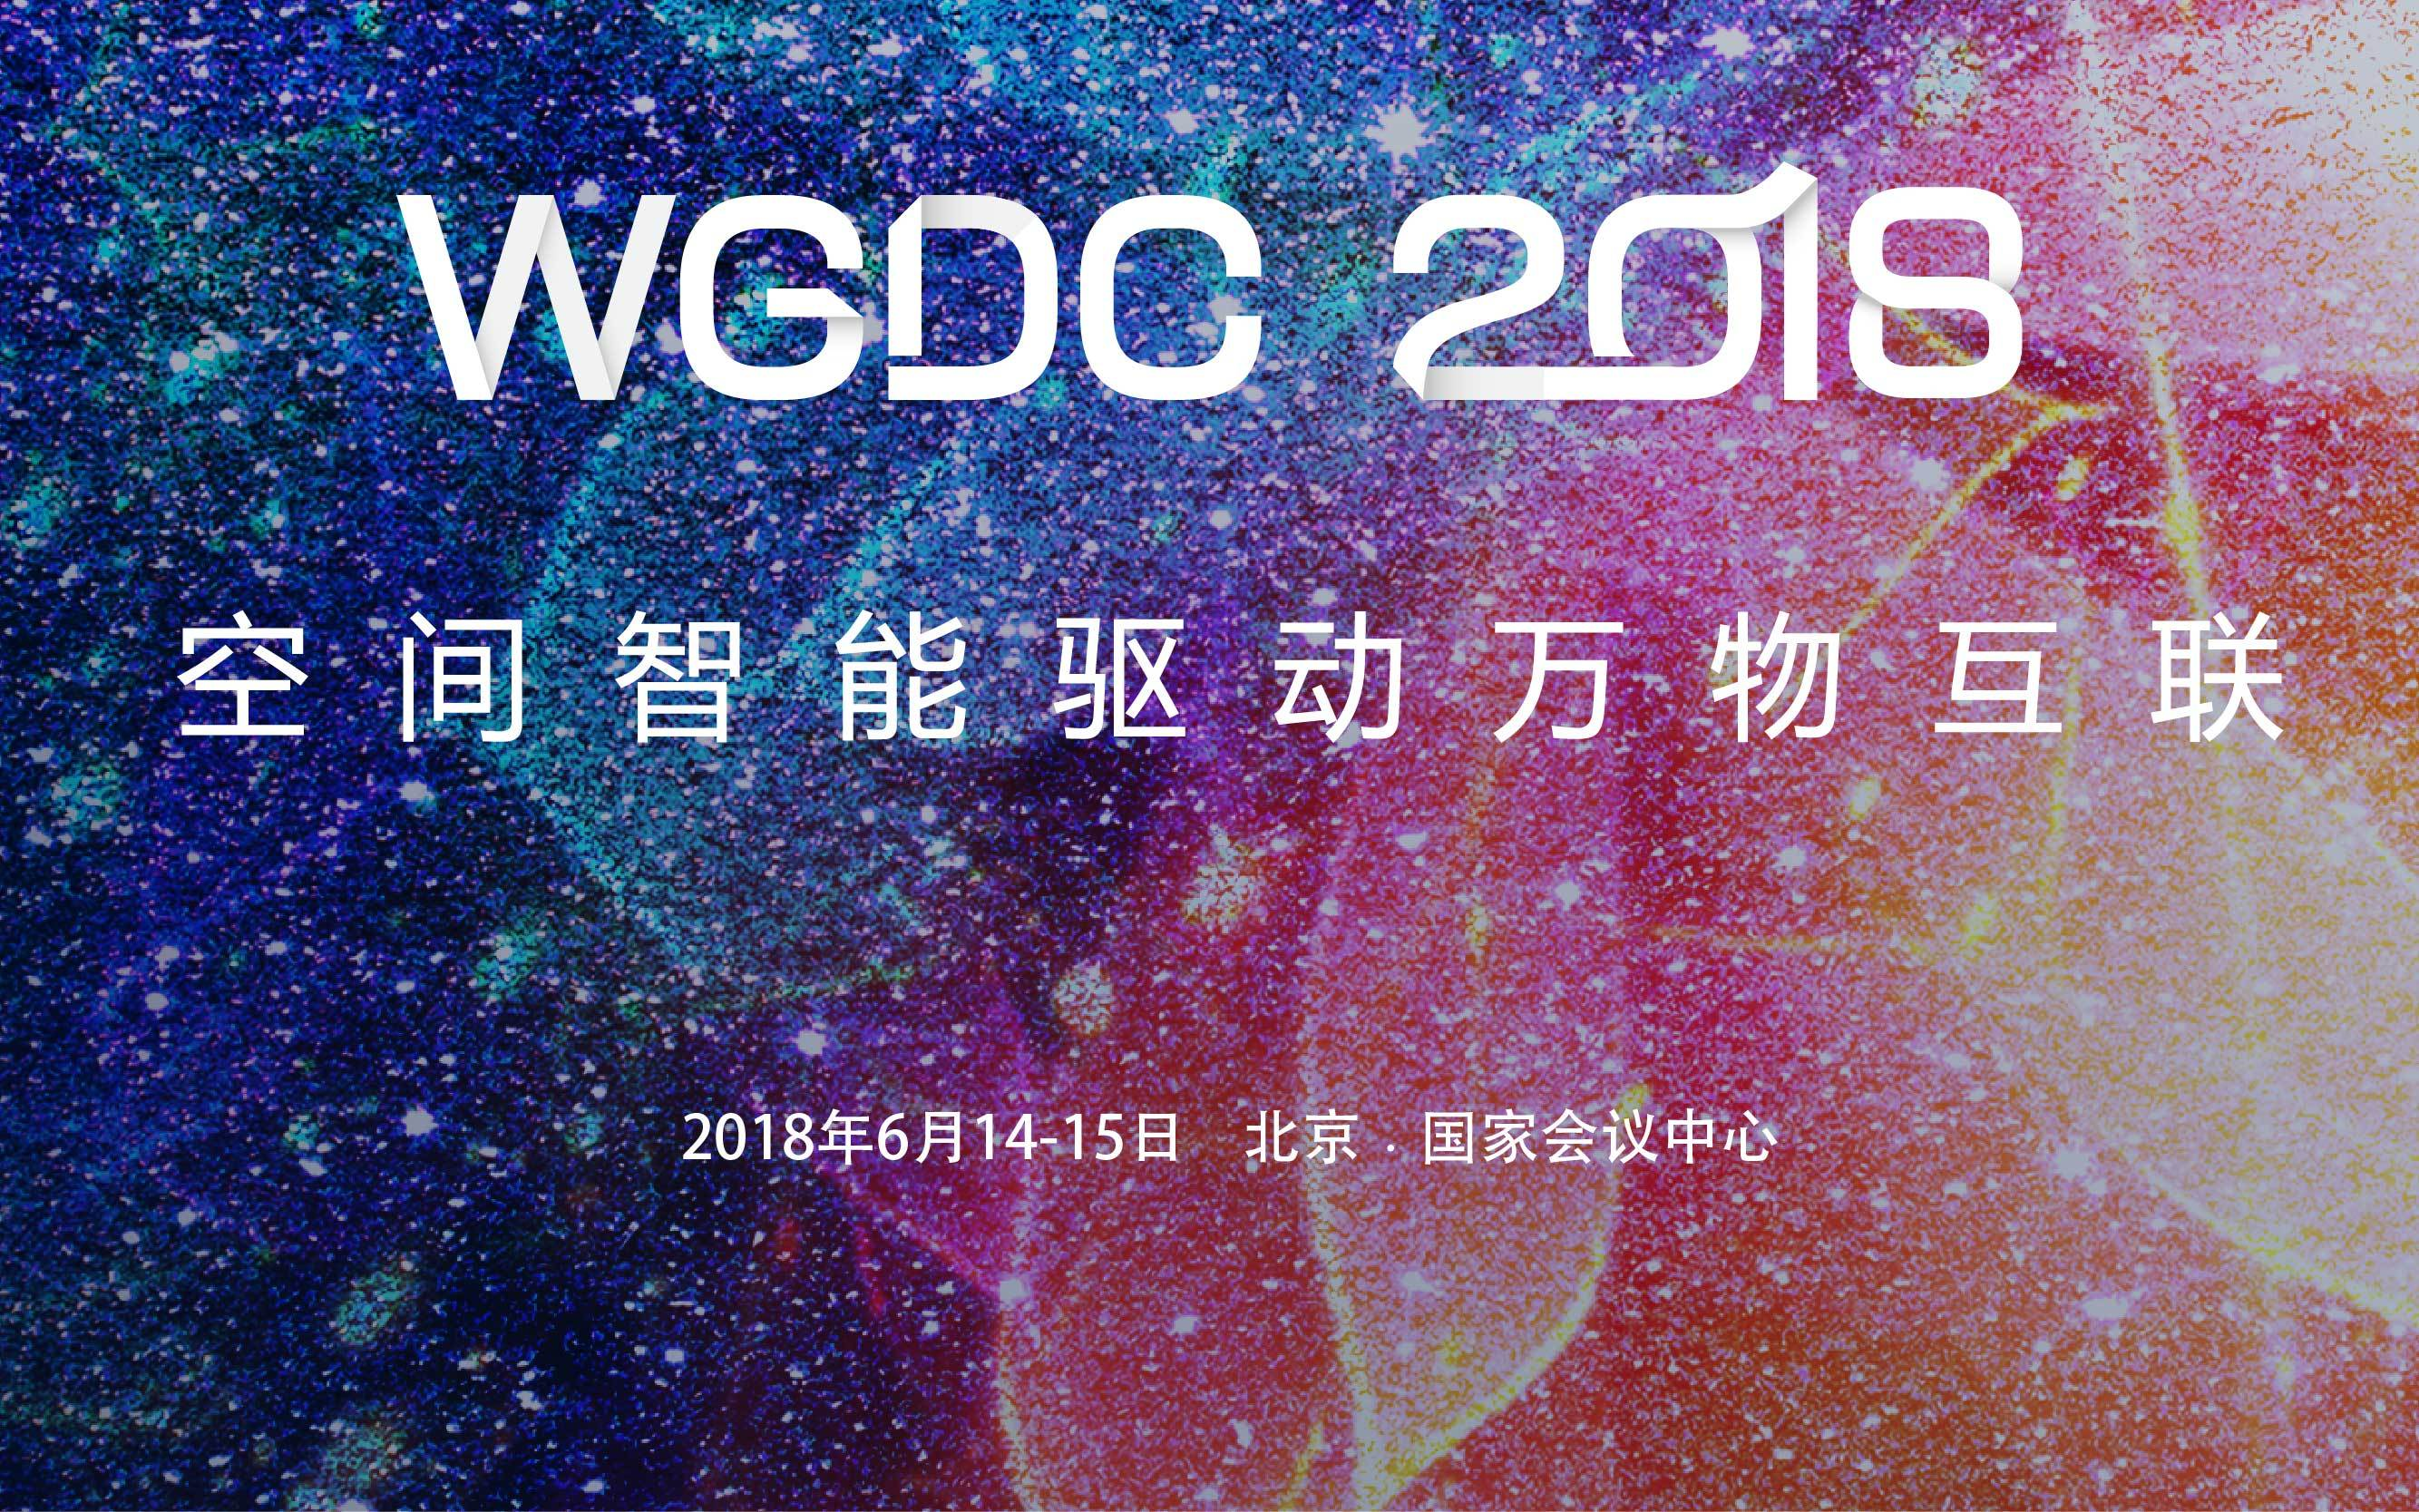 WGDC 2018地理低吼一�信息�_�l者大��